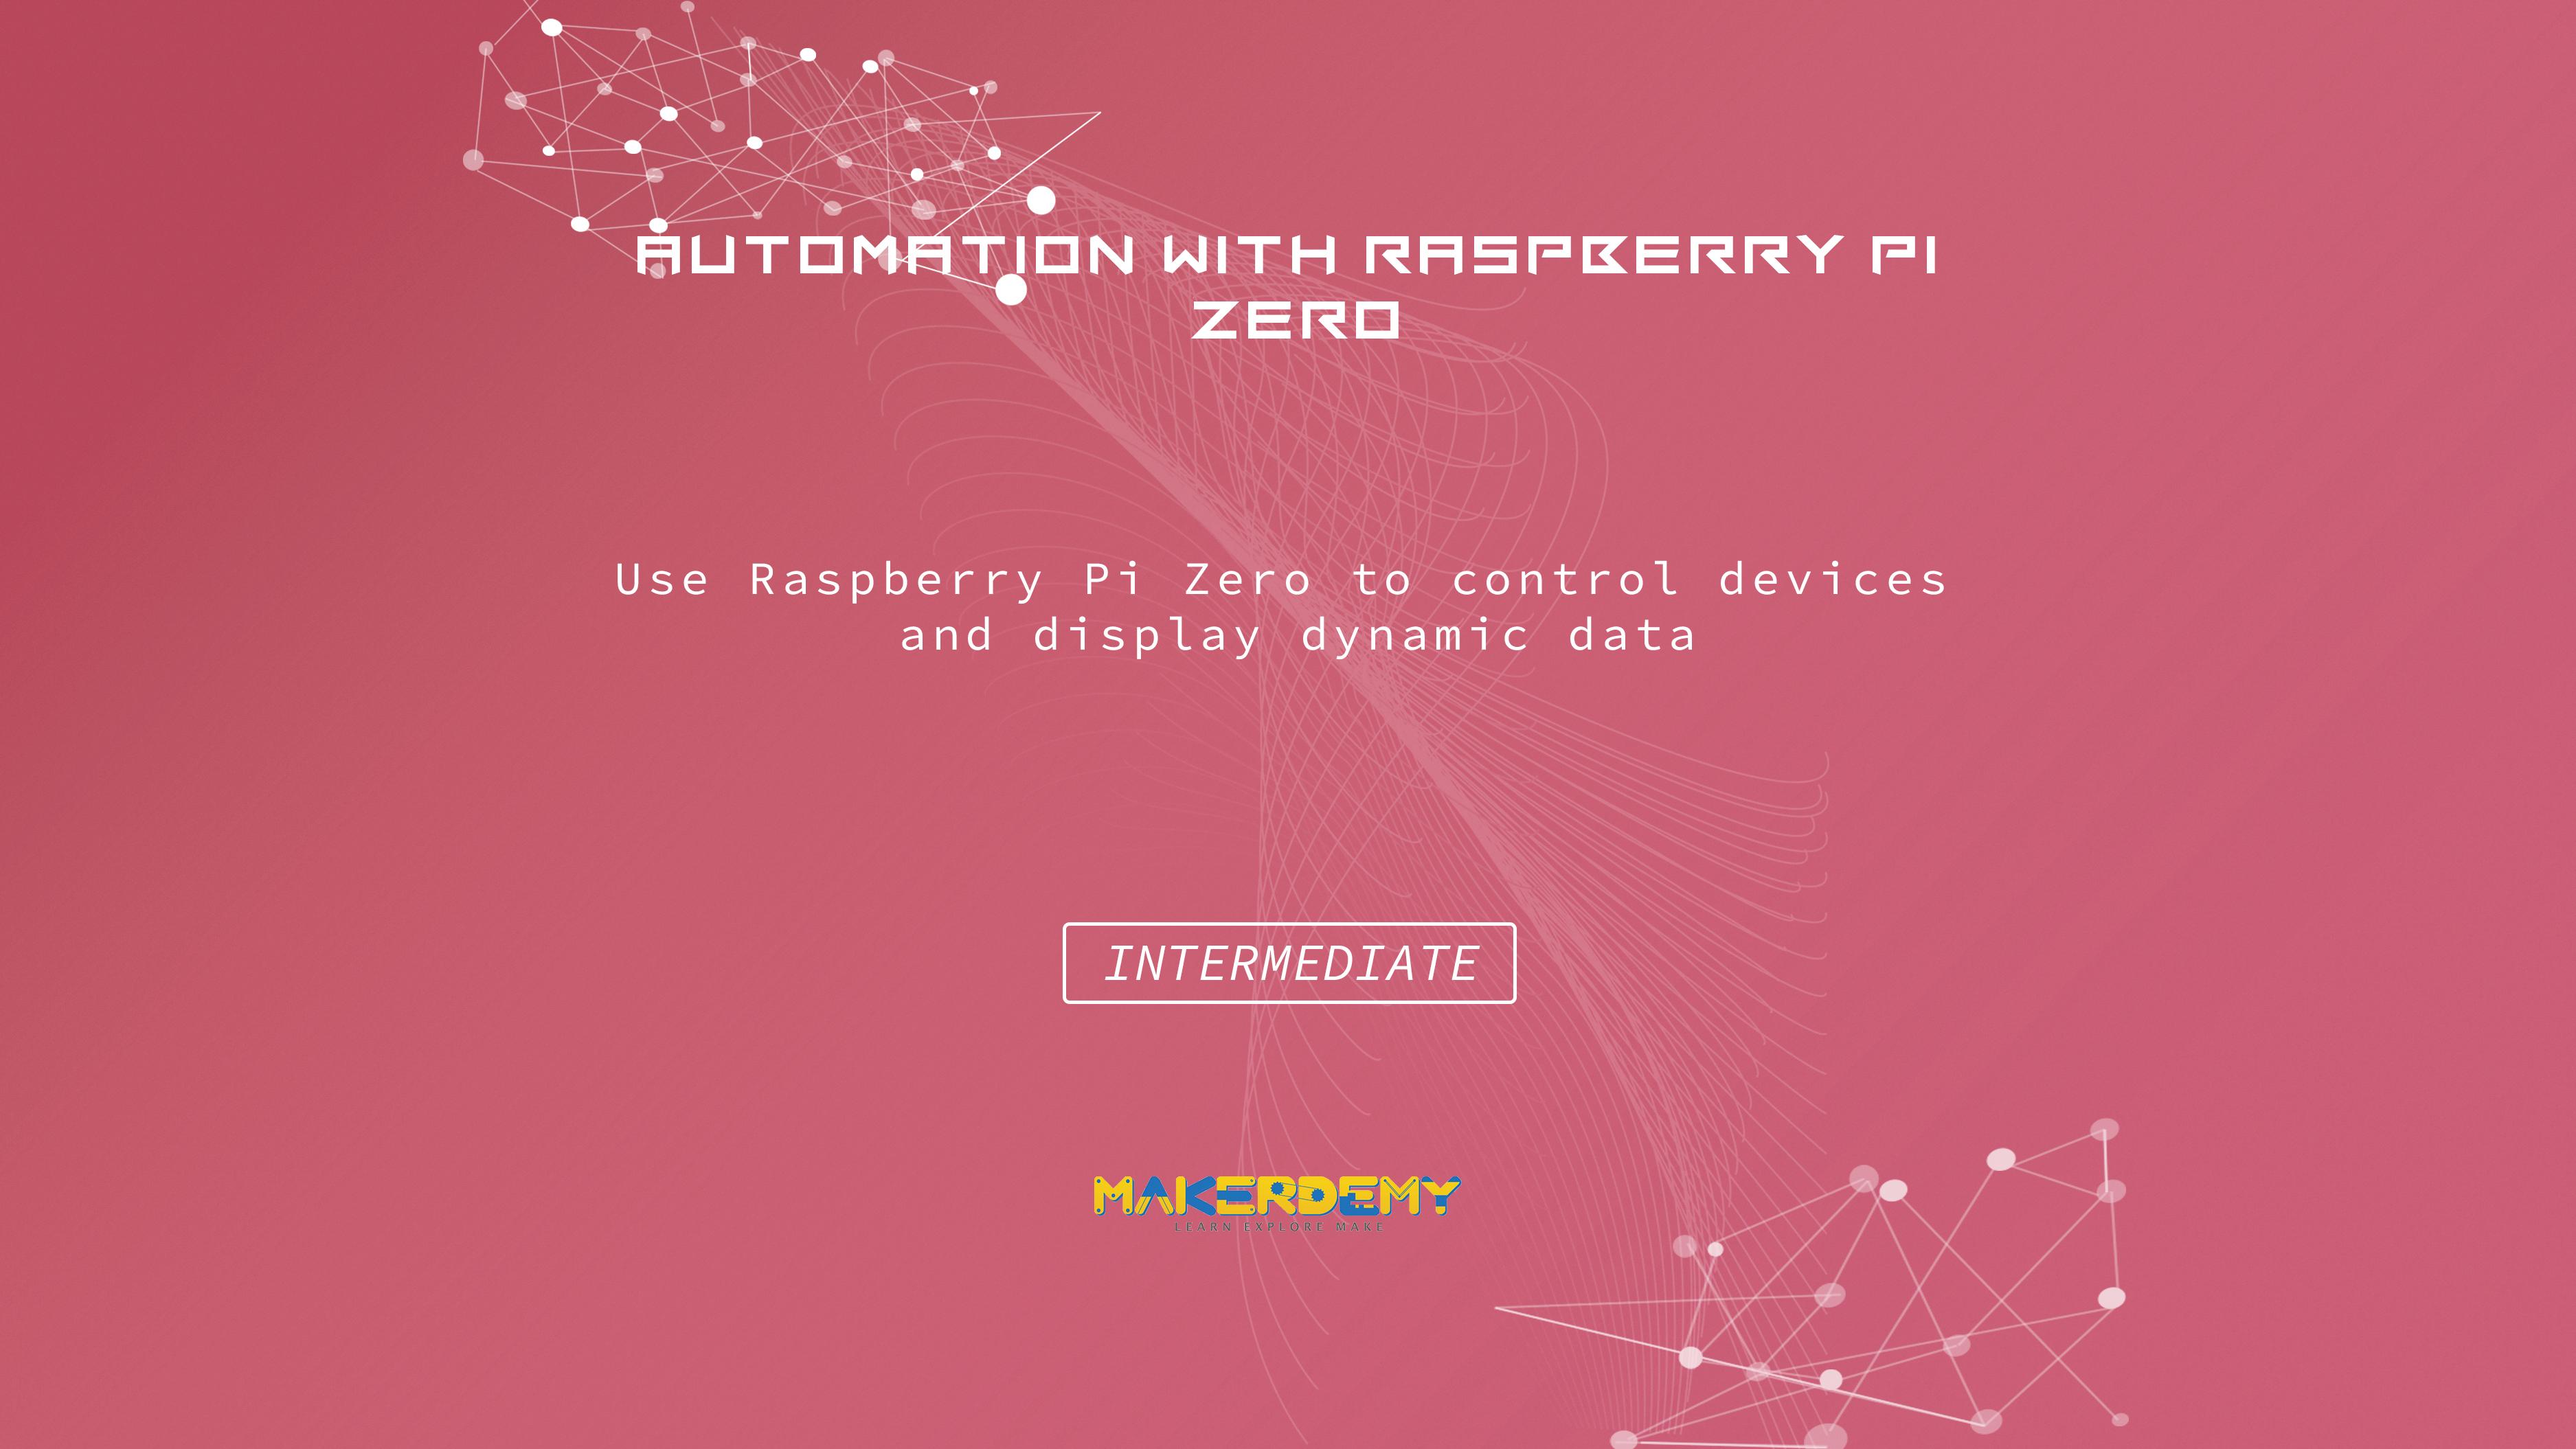 Automation with Raspberry Pi Zero